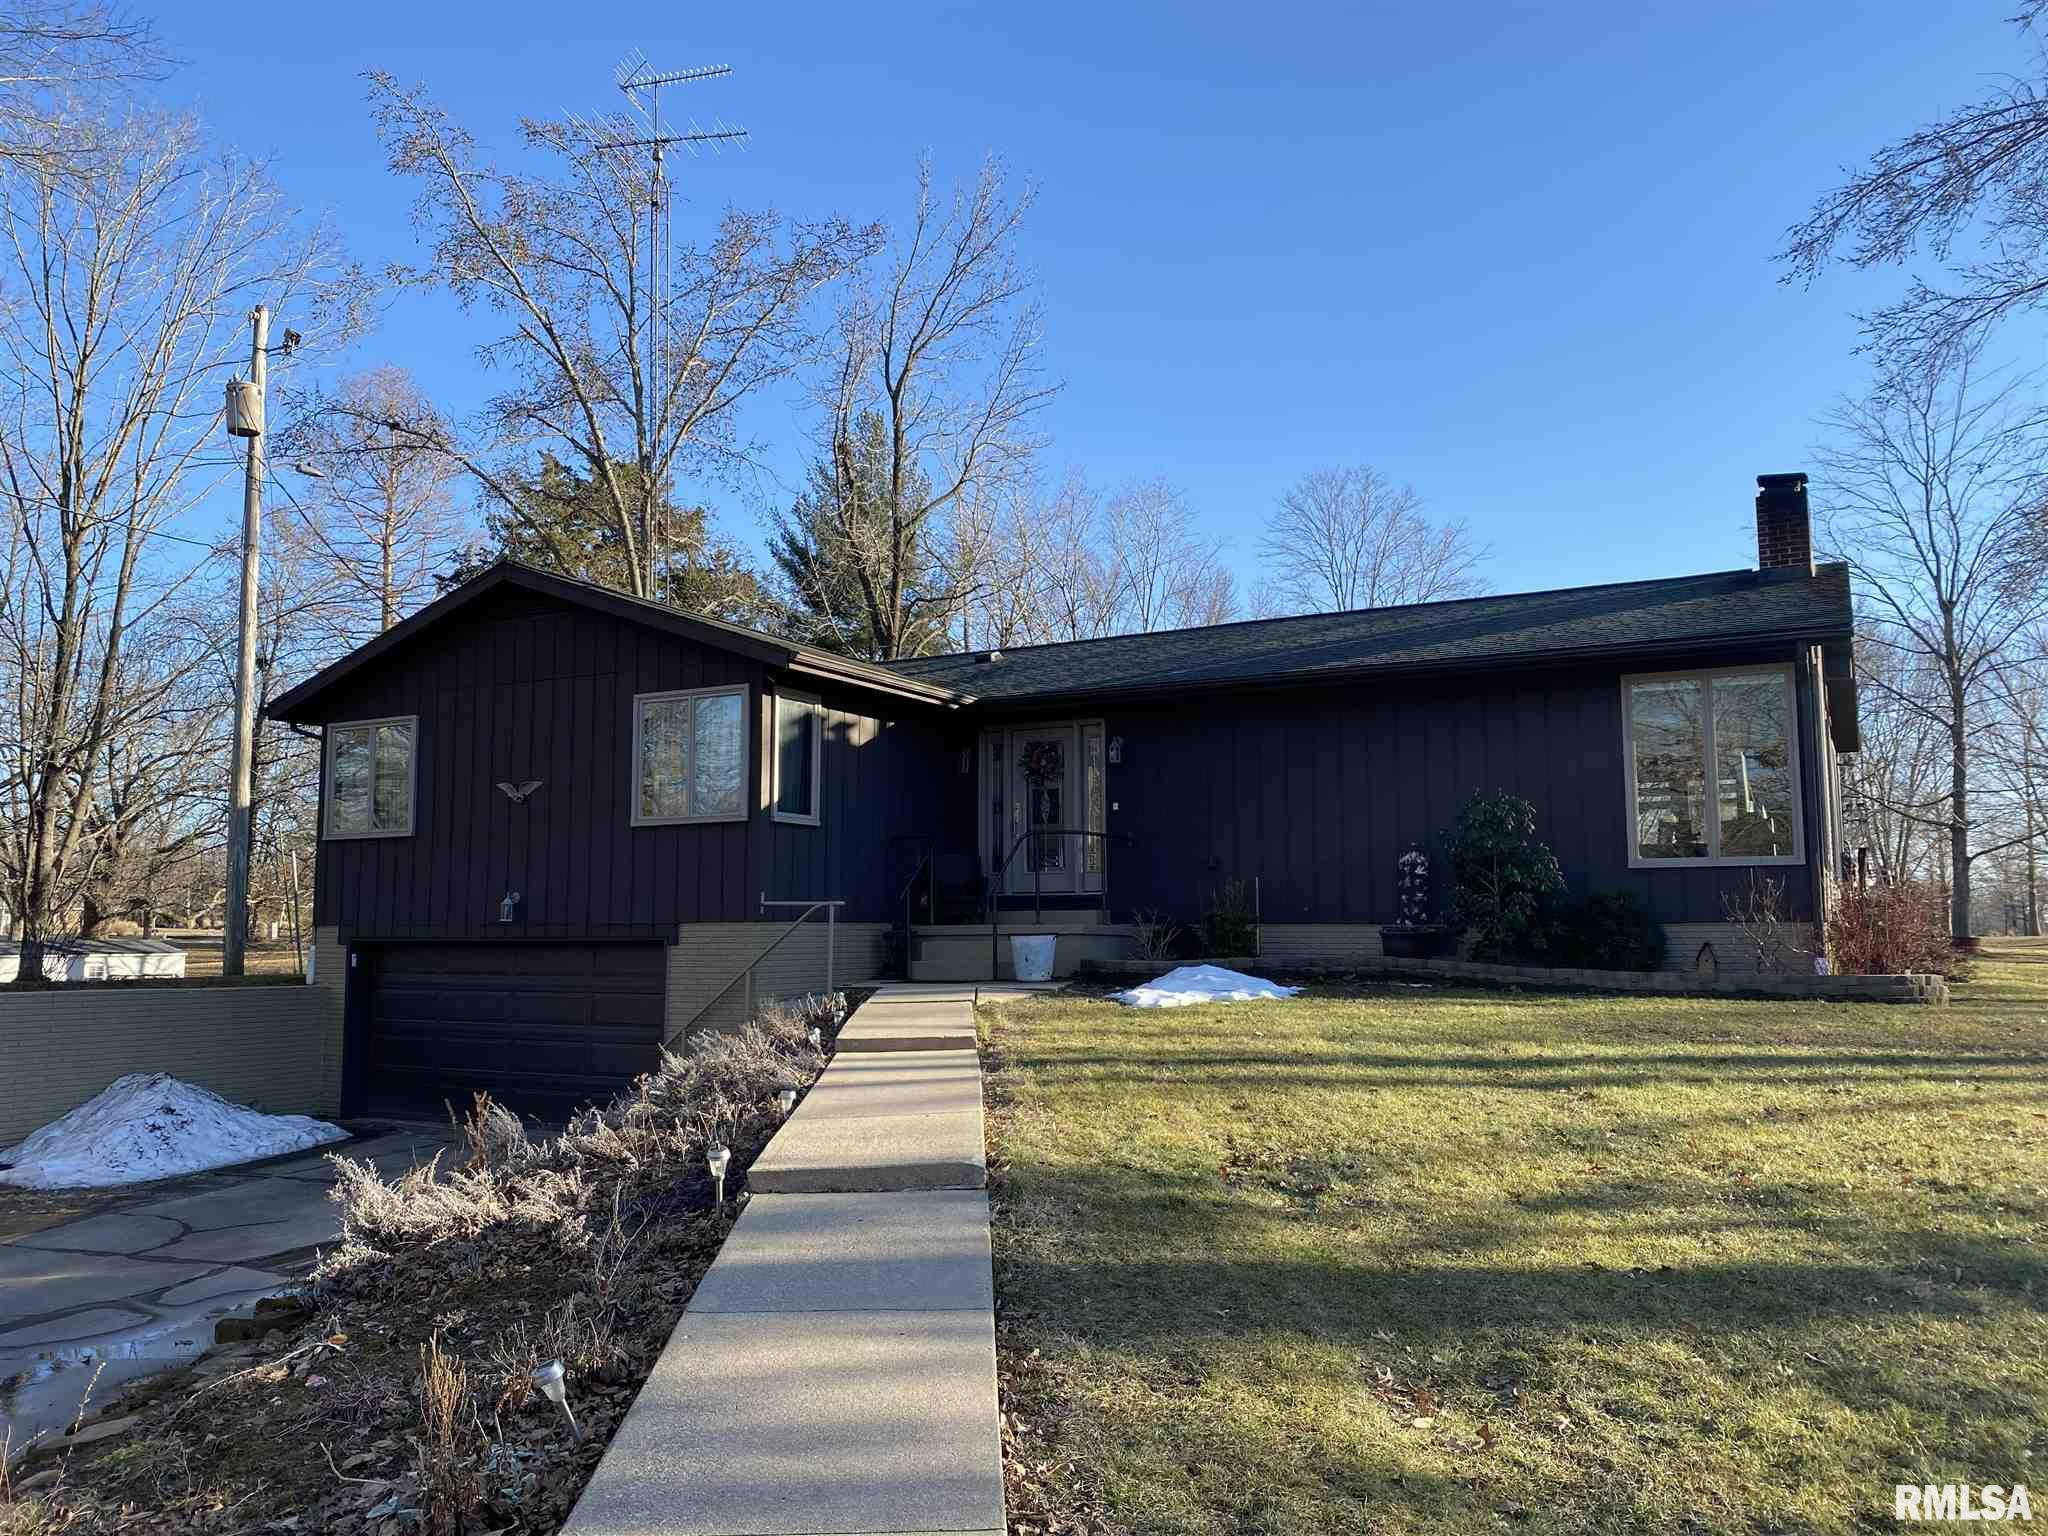 2163 MEADOW Property Photo - Centralia, IL real estate listing